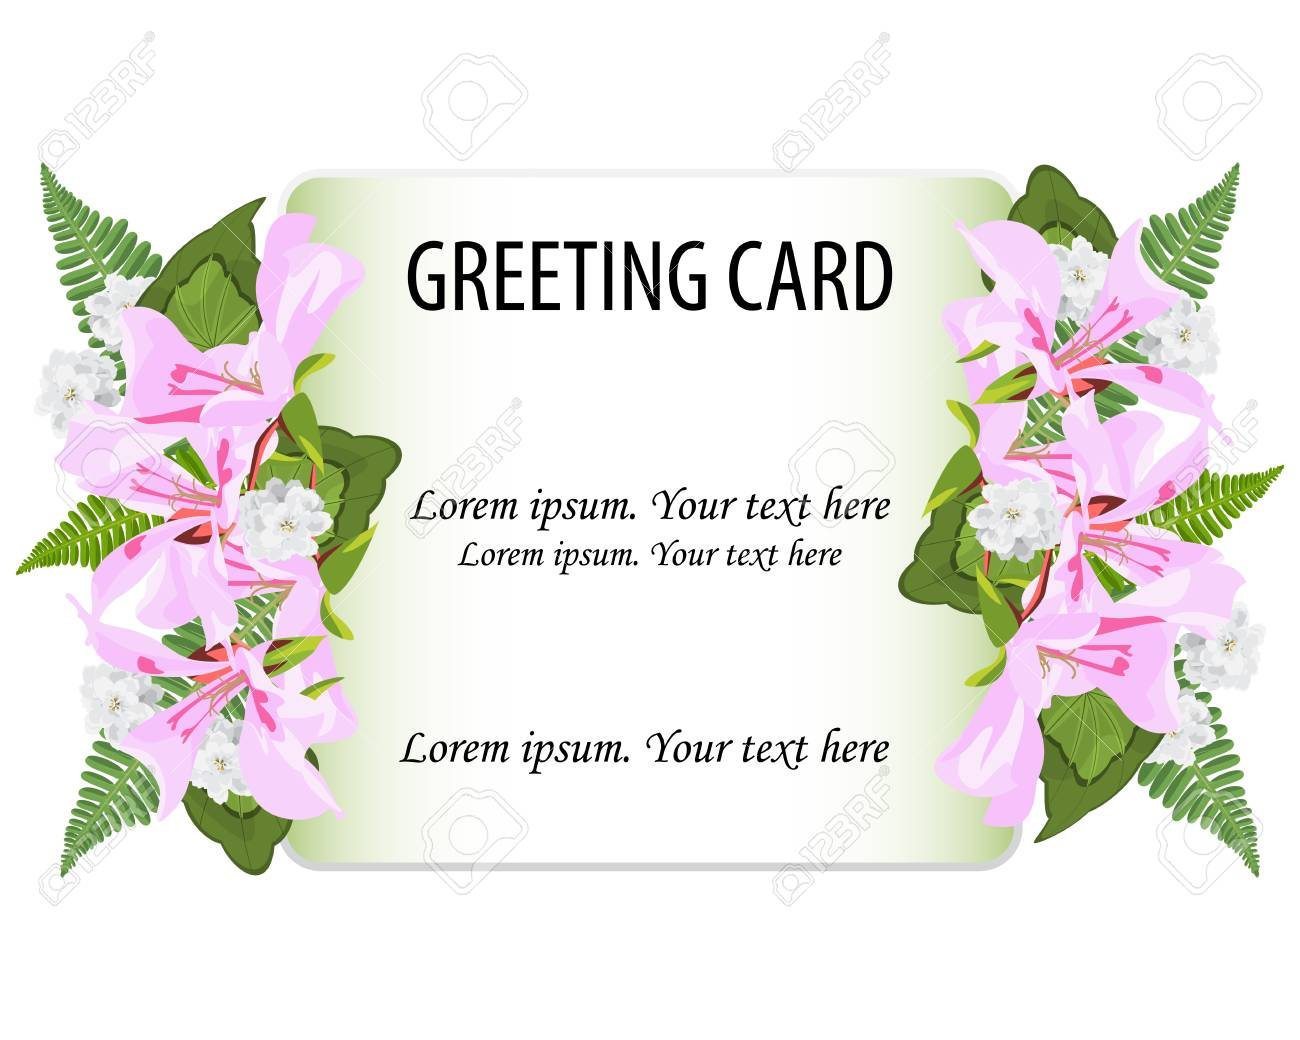 Wedding Invitation Card Greeting Card Vector Floral Greenery